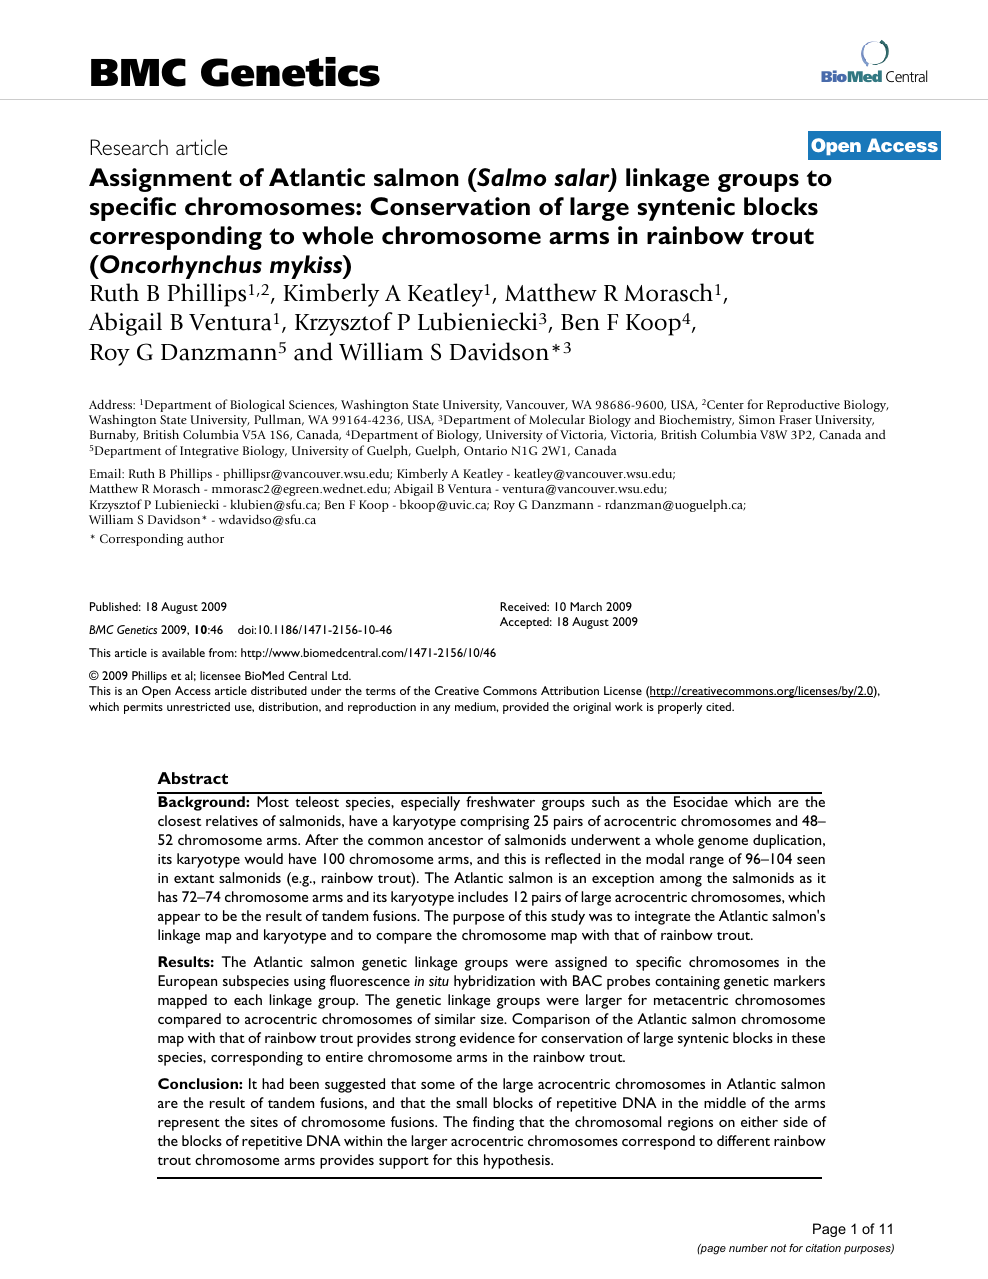 Assignment of Atlantic salmon (Salmo salar) linkage groups